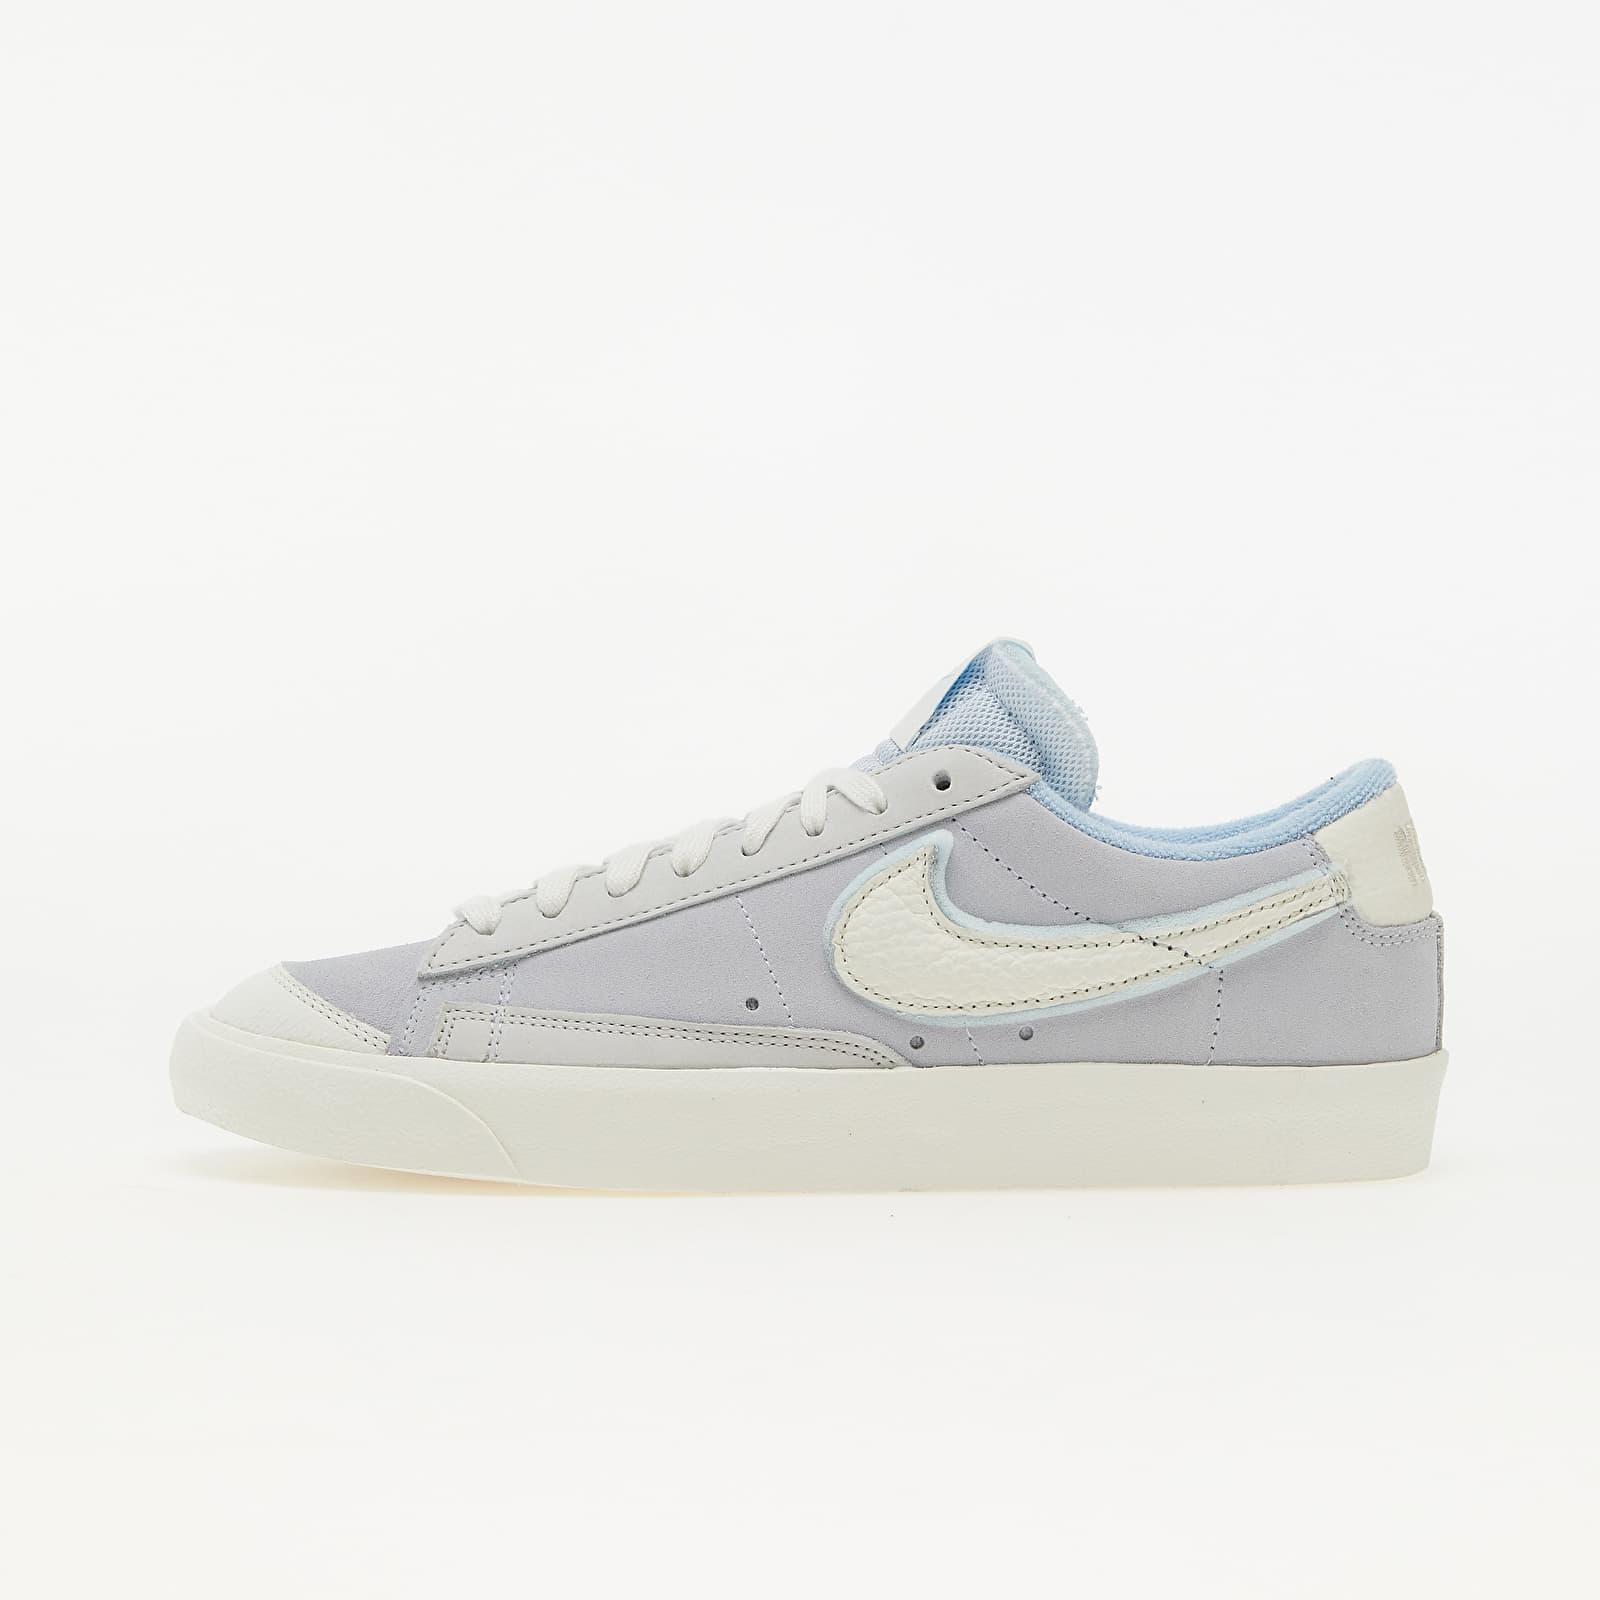 Nike Blazer Low Vintage '77 Football Grey/ Sail-Psychic Blue DH4101-001